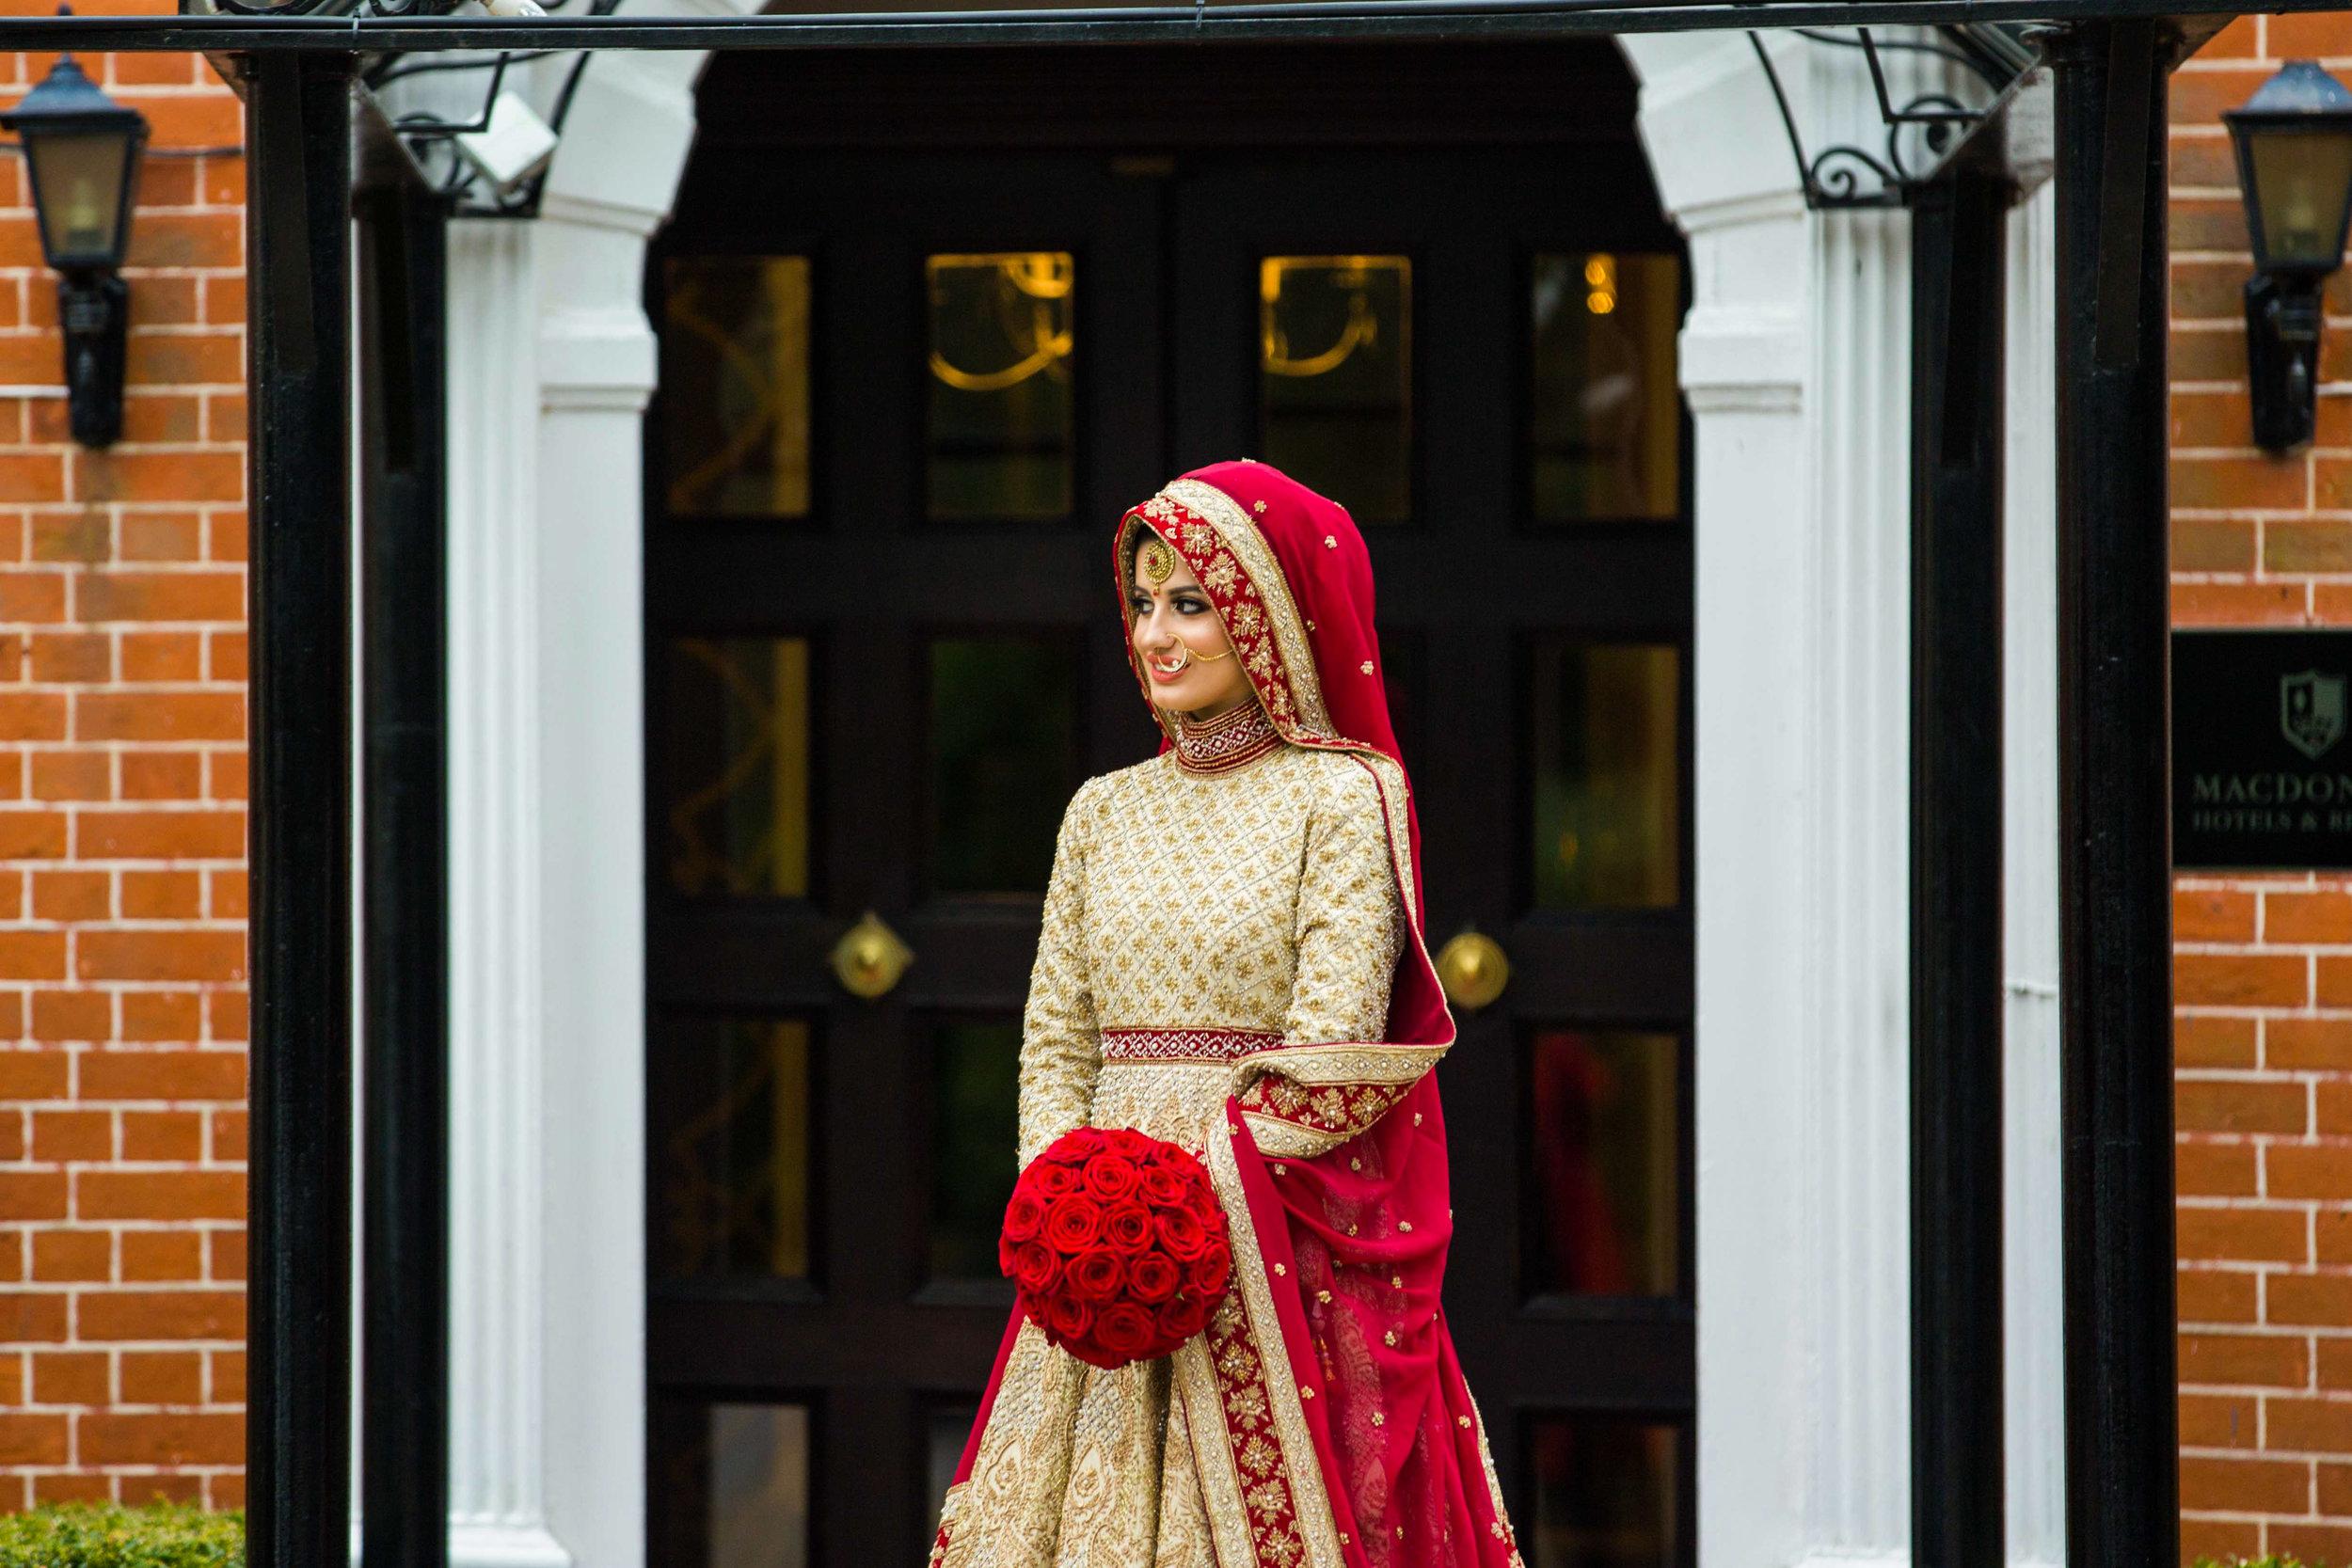 Macdonald-Berystede-Hotel-wedding-female-asian-wedding-photographer-london-natalia-smith-photography-27-2.jpg